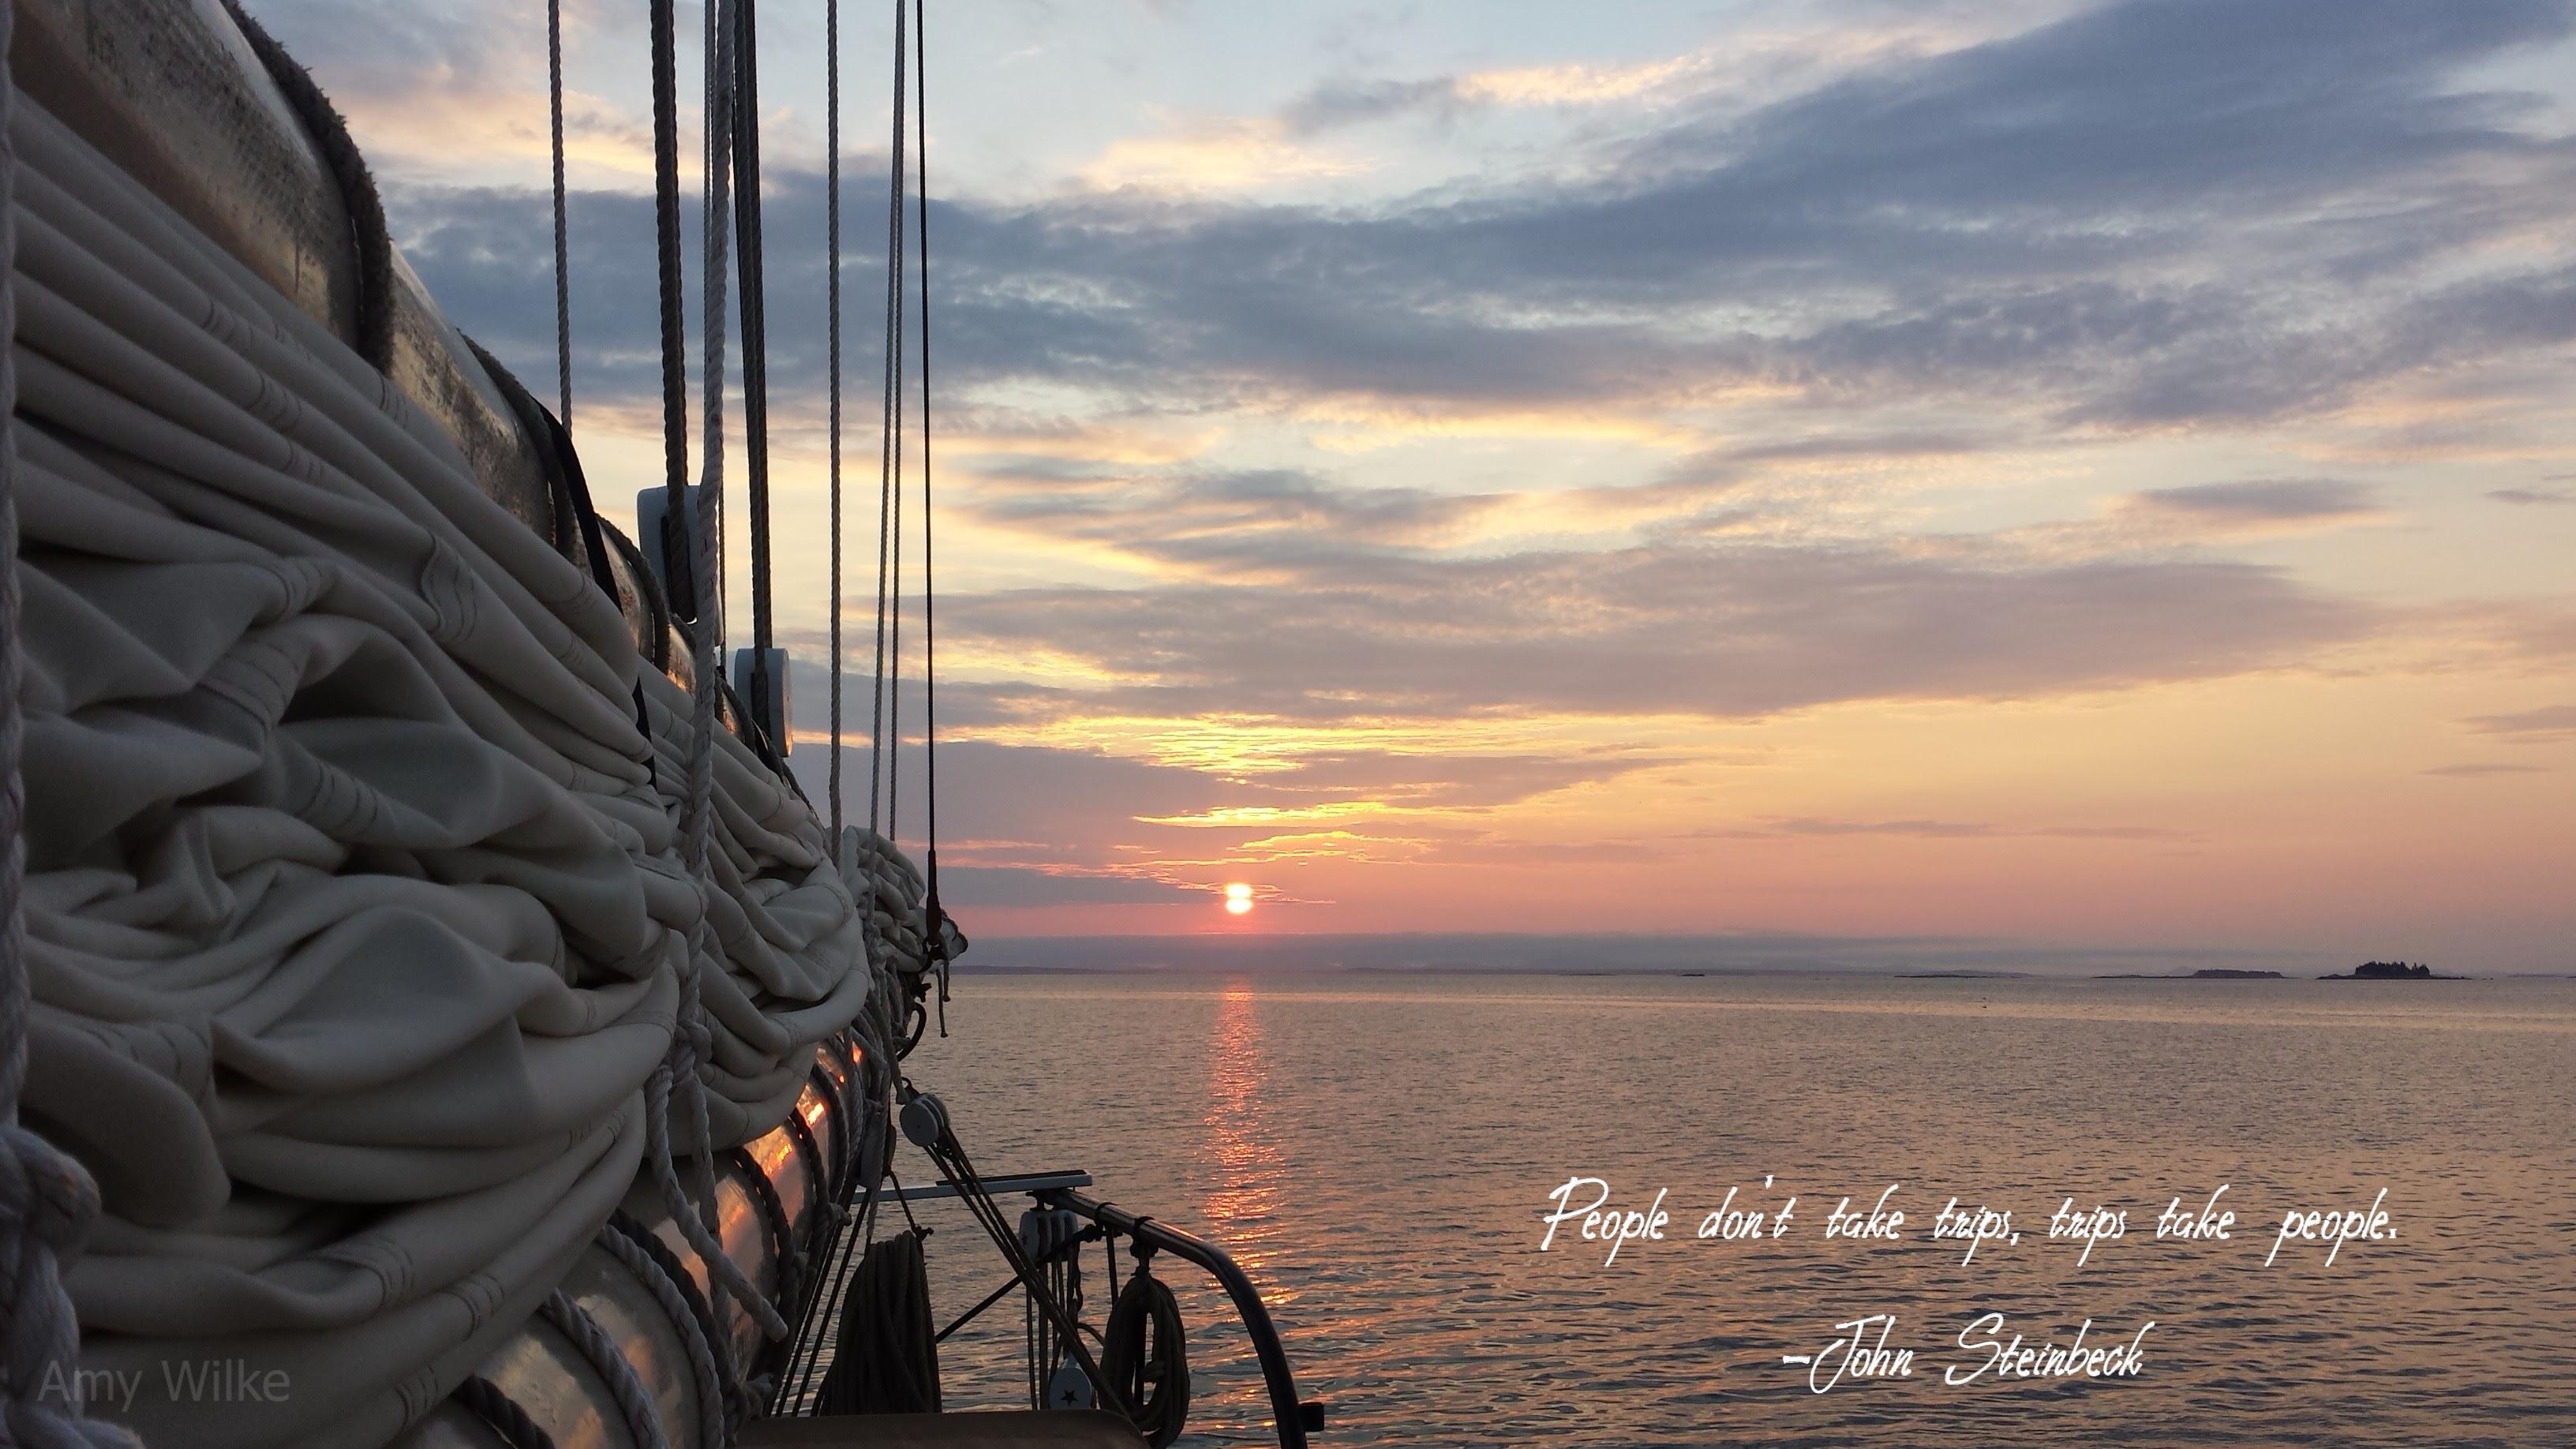 Ocean Love Quote Maine Windjammer J E Riggin